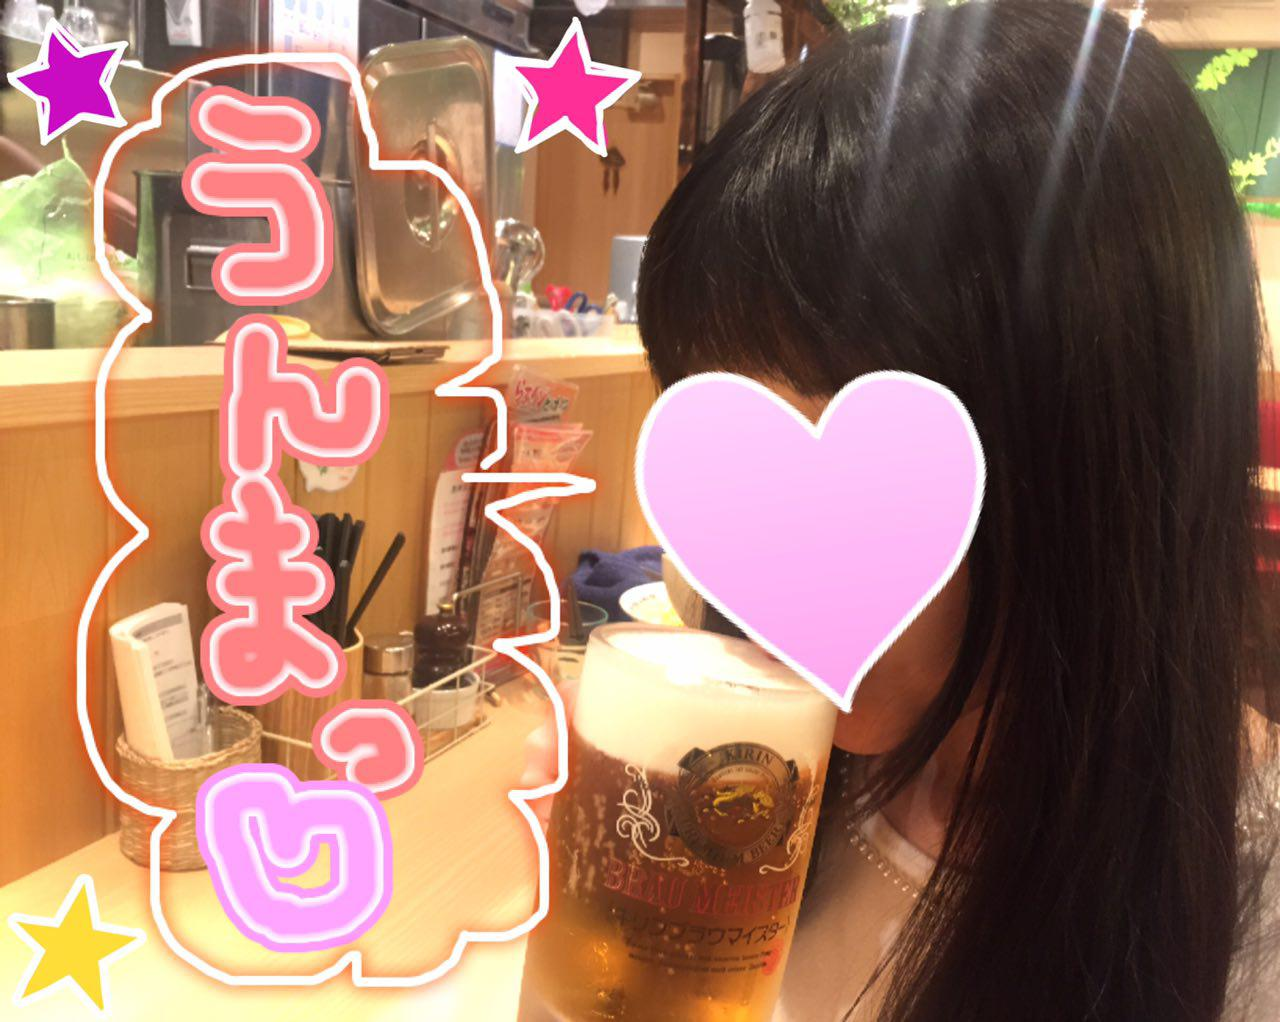 photo_2017-03-05_00-33-19.jpg